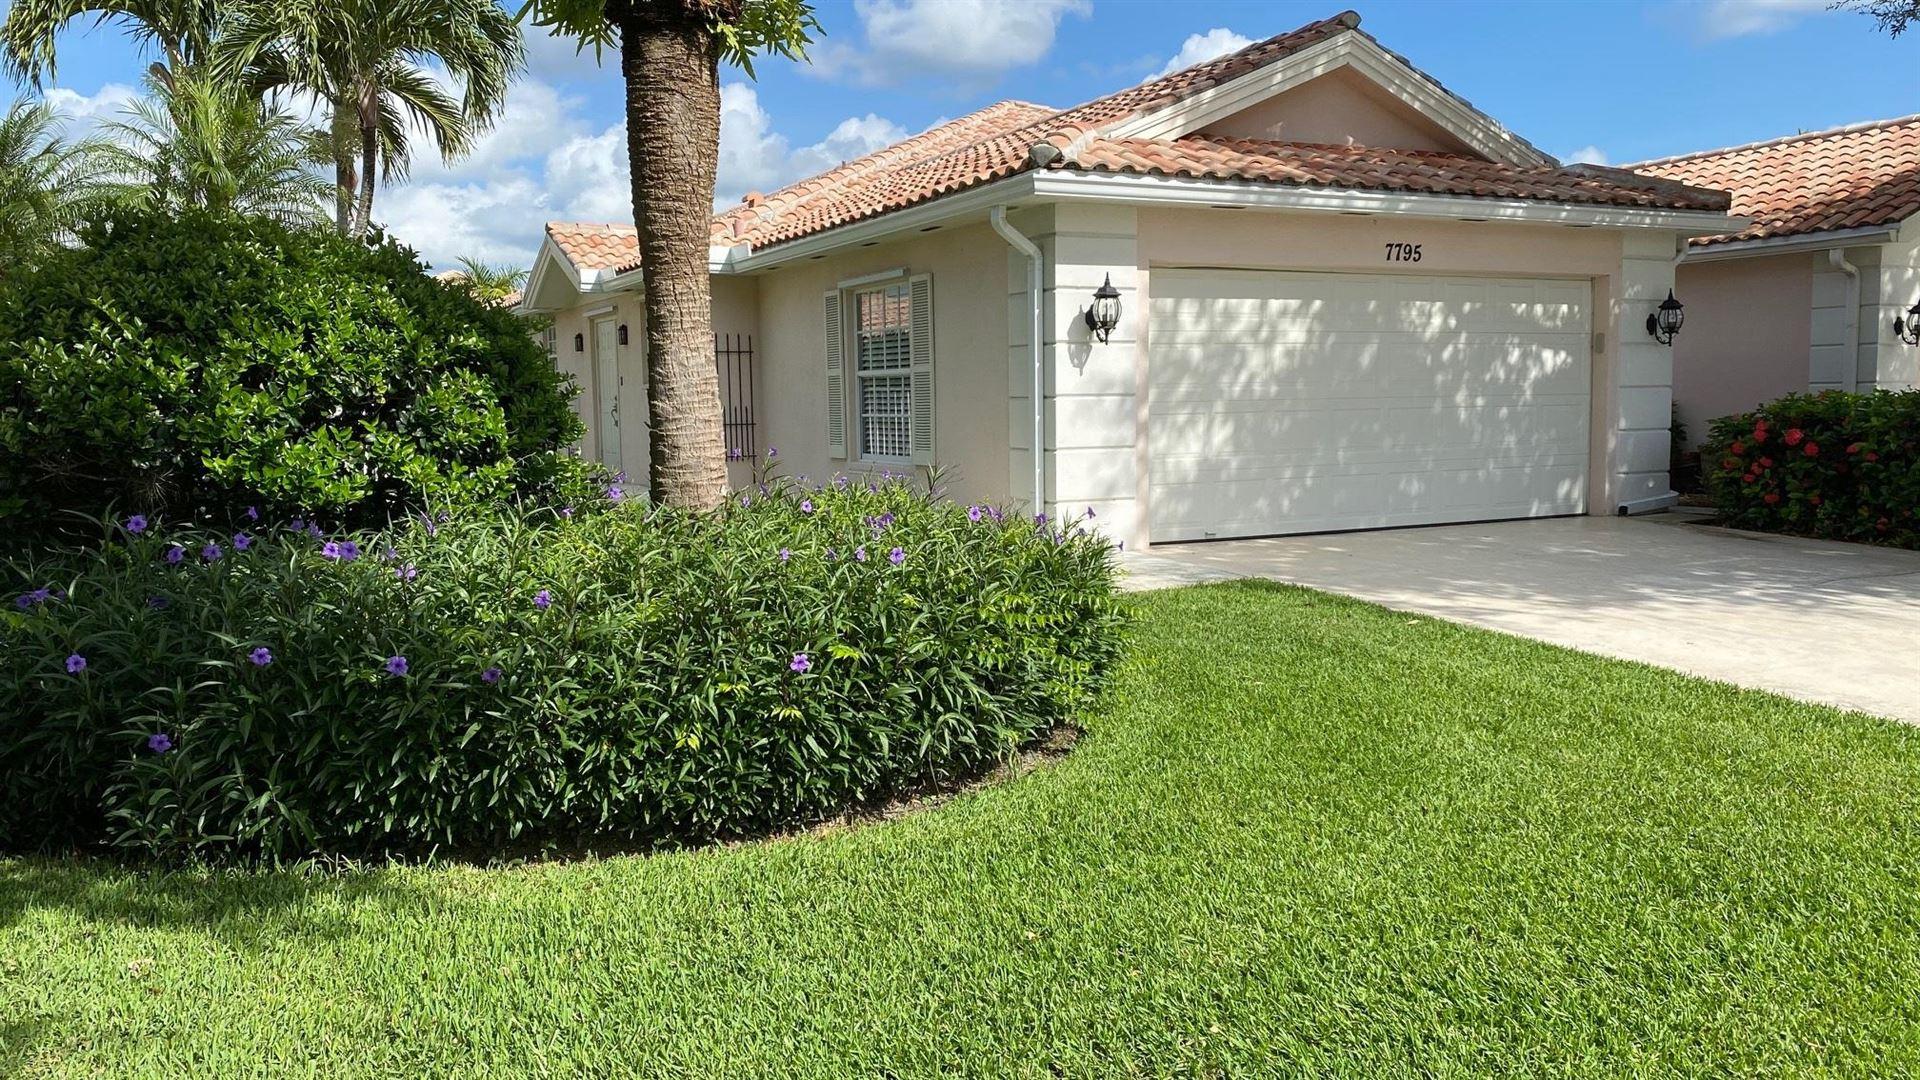 7795 Nile River Road, West Palm Beach, FL 33411 - #: RX-10637103